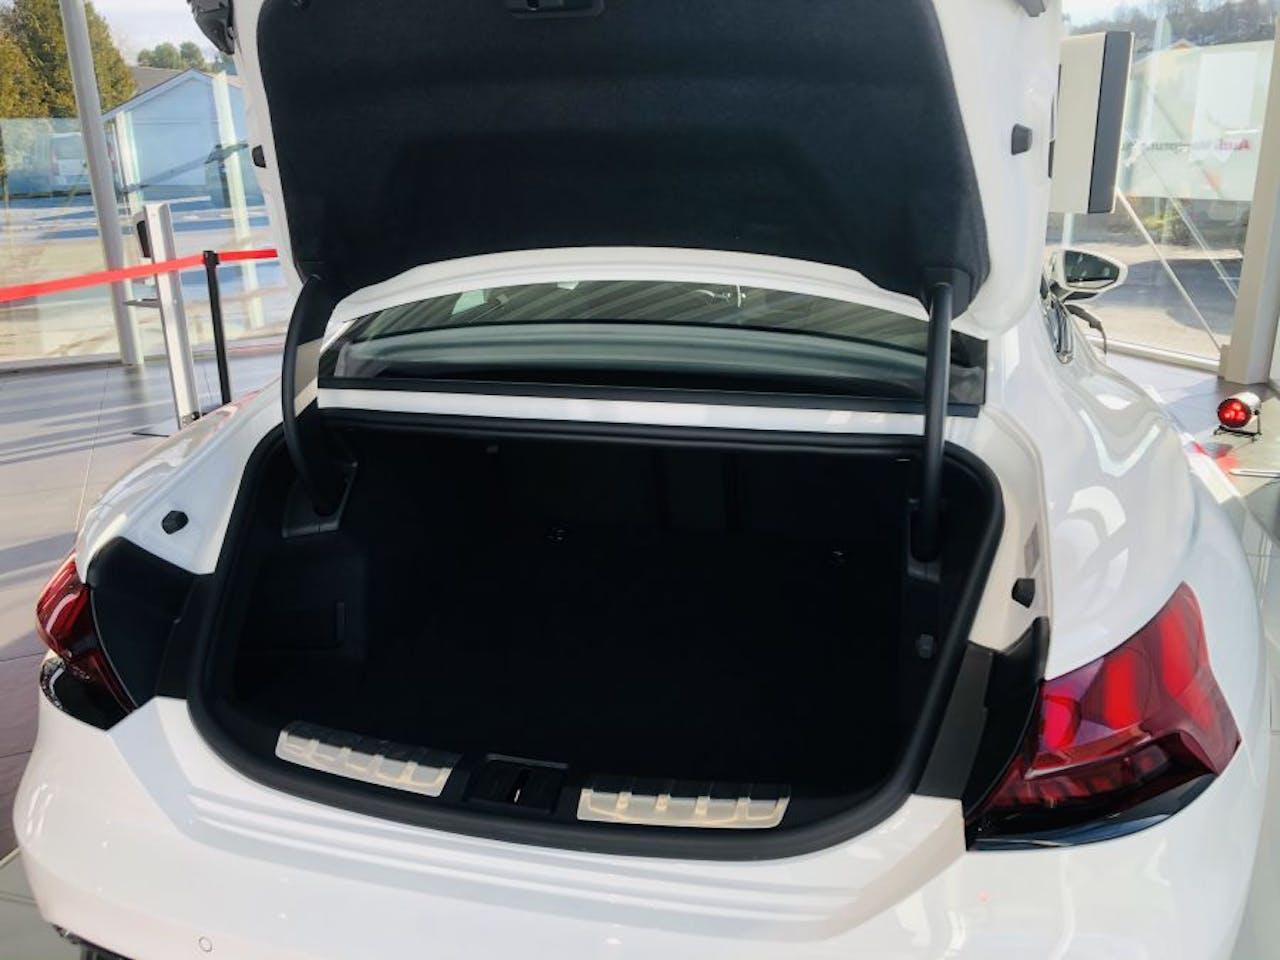 Kofferraumklappe und Kofferraum des Audi e-tron GT